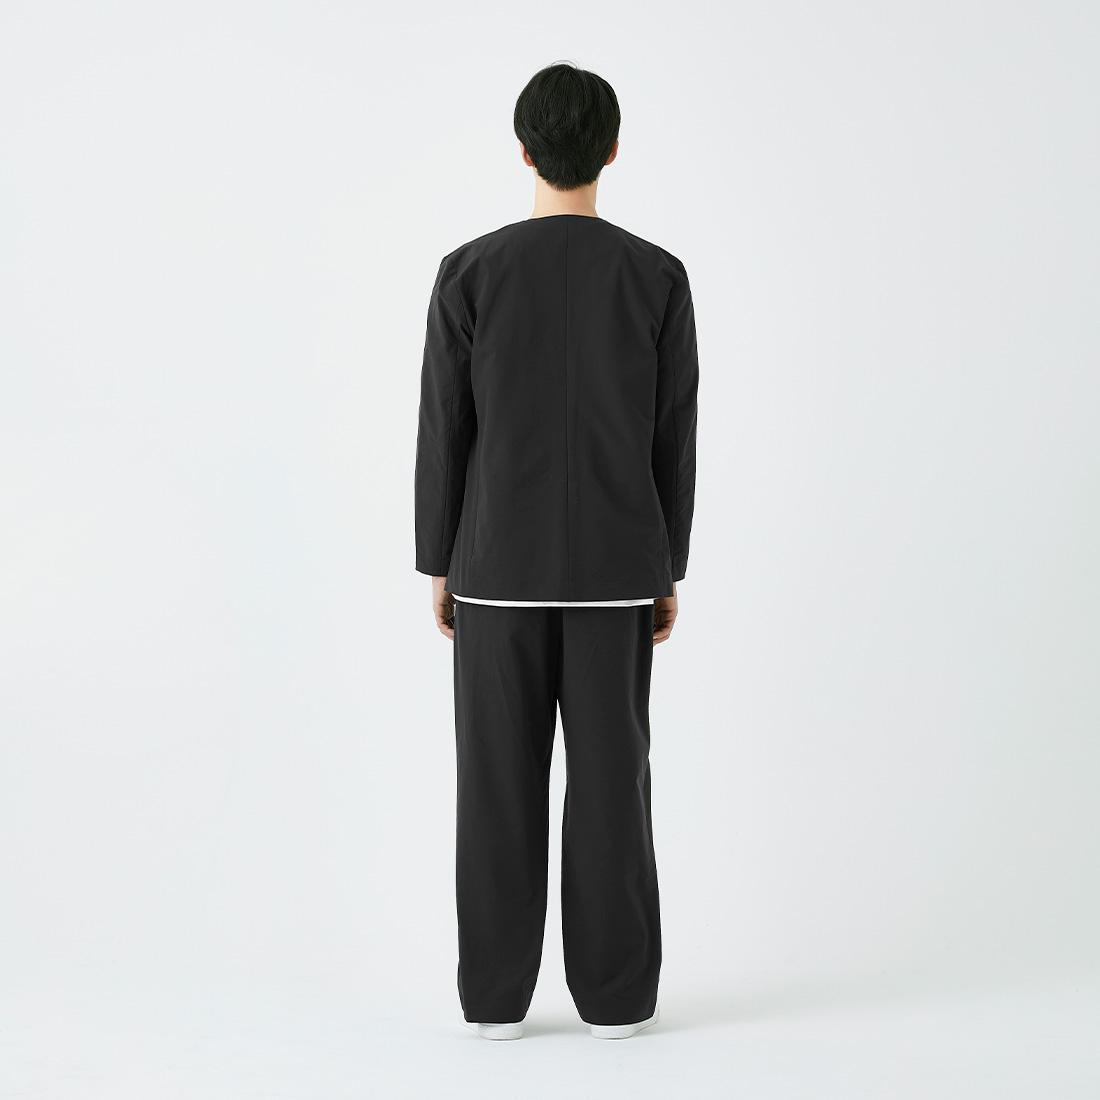 borderless no-collar jacket -male-の商品写真15